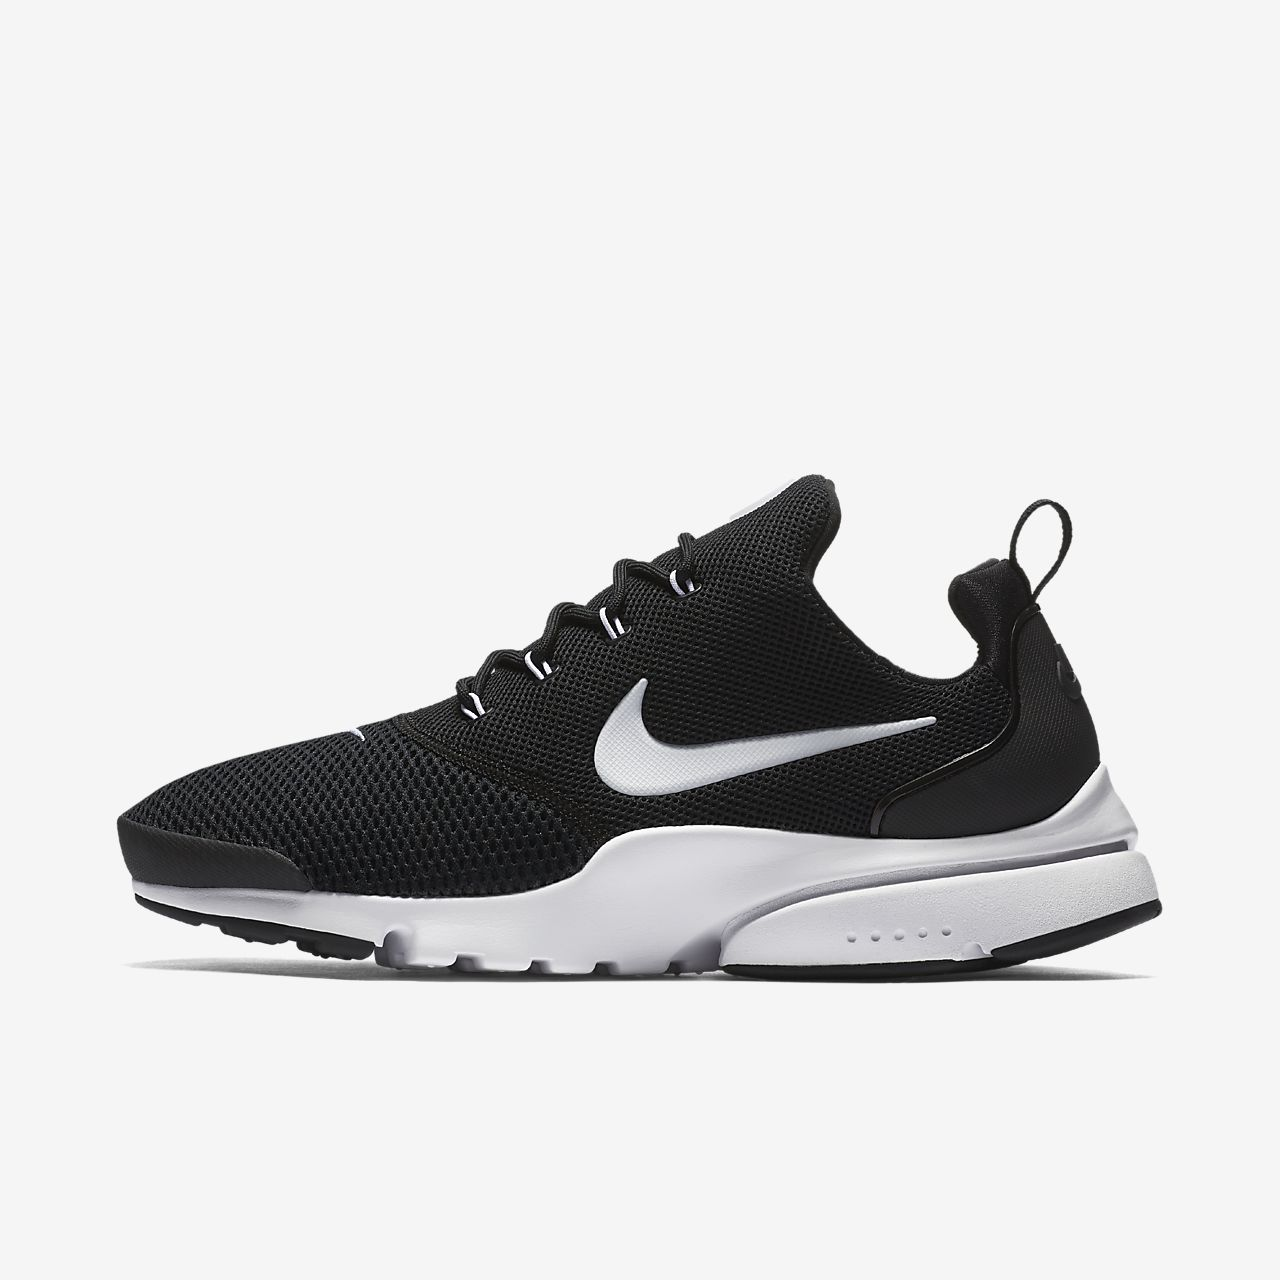 buy popular 46a92 9a3f0 Nike Presto Fly Men s Shoe. Nike.com NZ